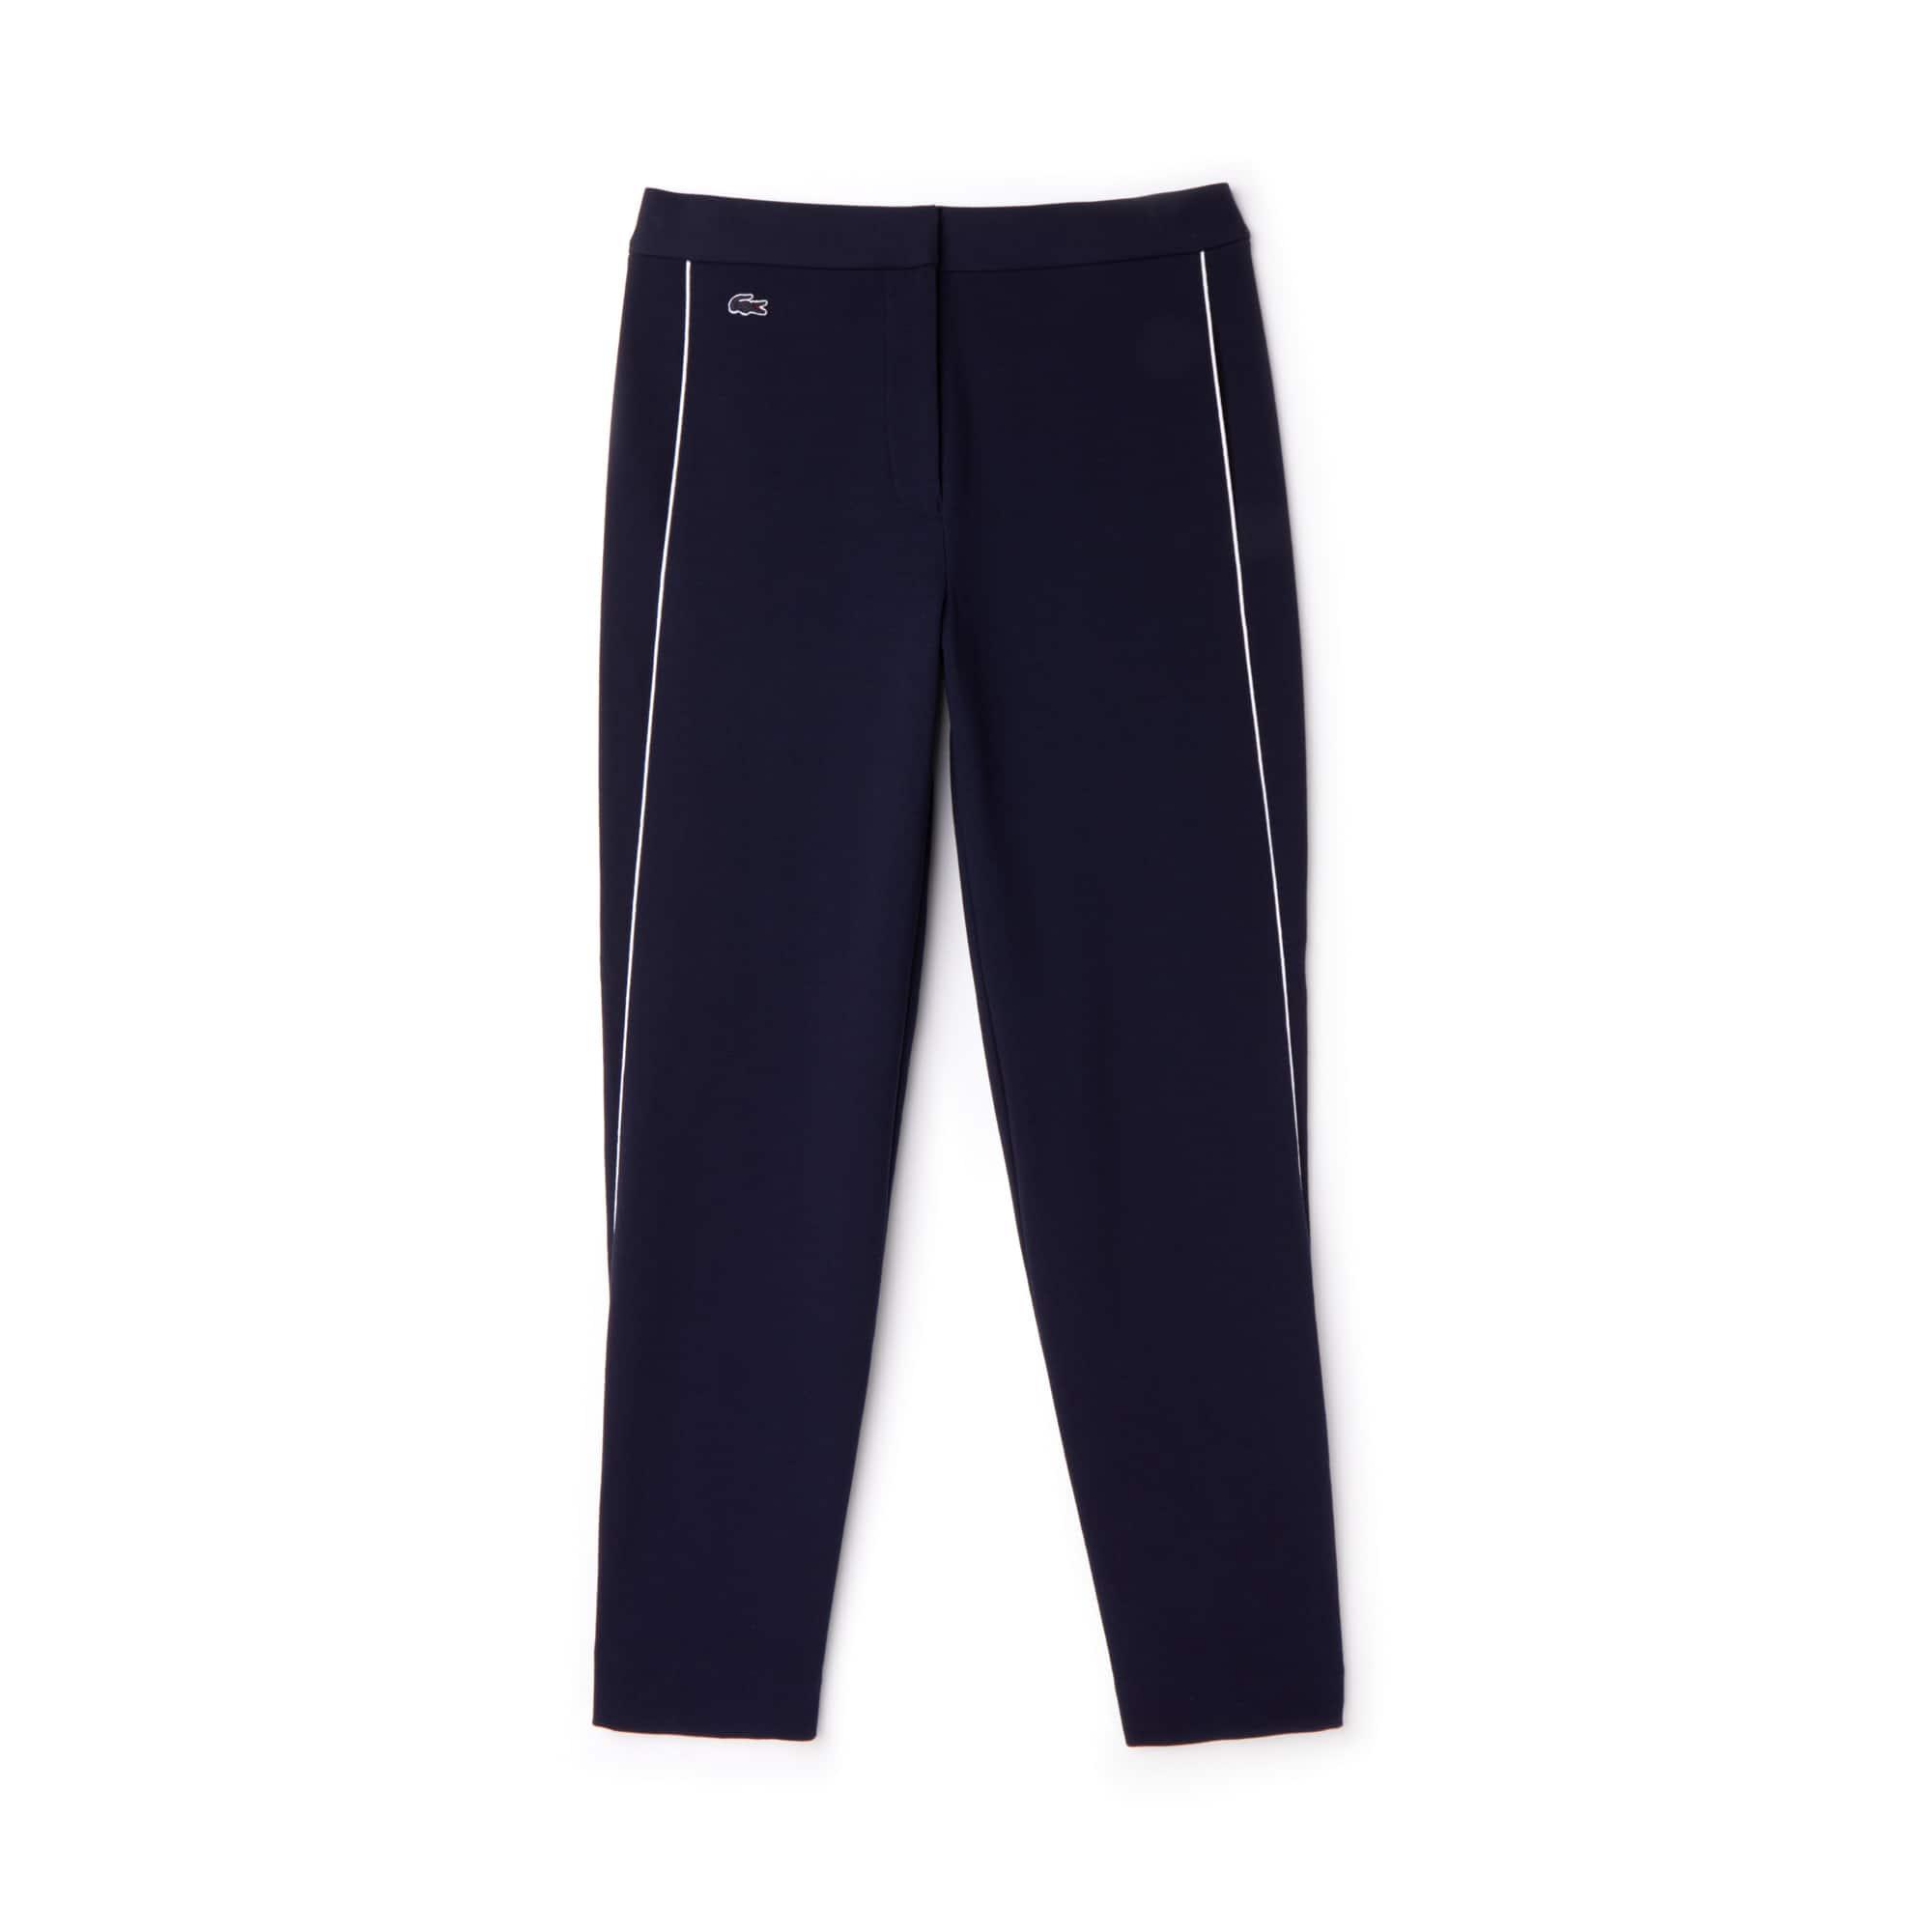 Women's Piped Cotton Crepe Interlock Carrot Pants